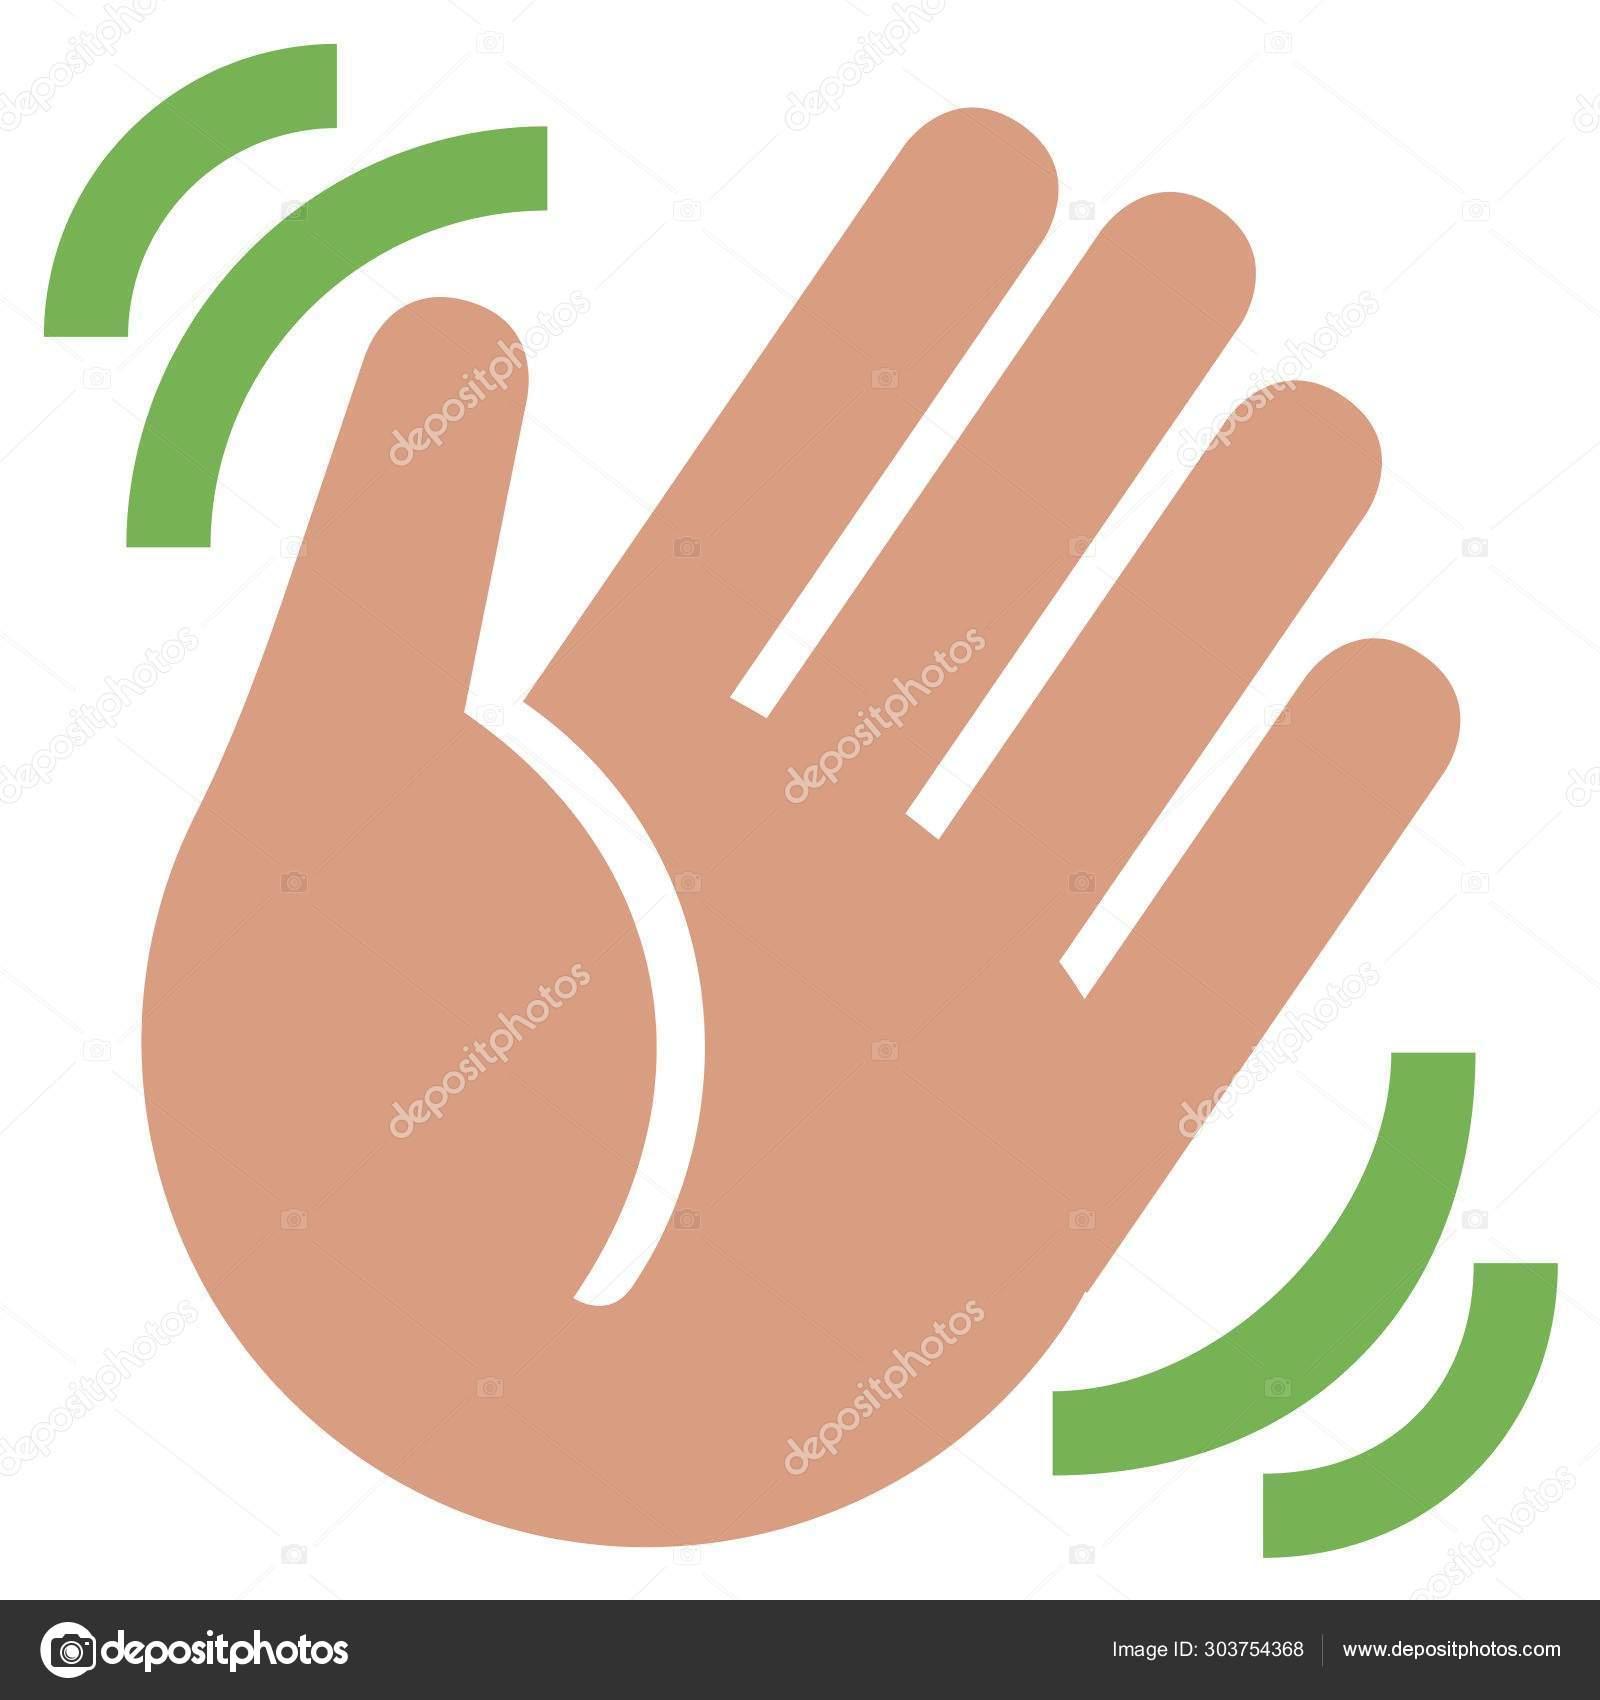 hand waving clipart - 900×900